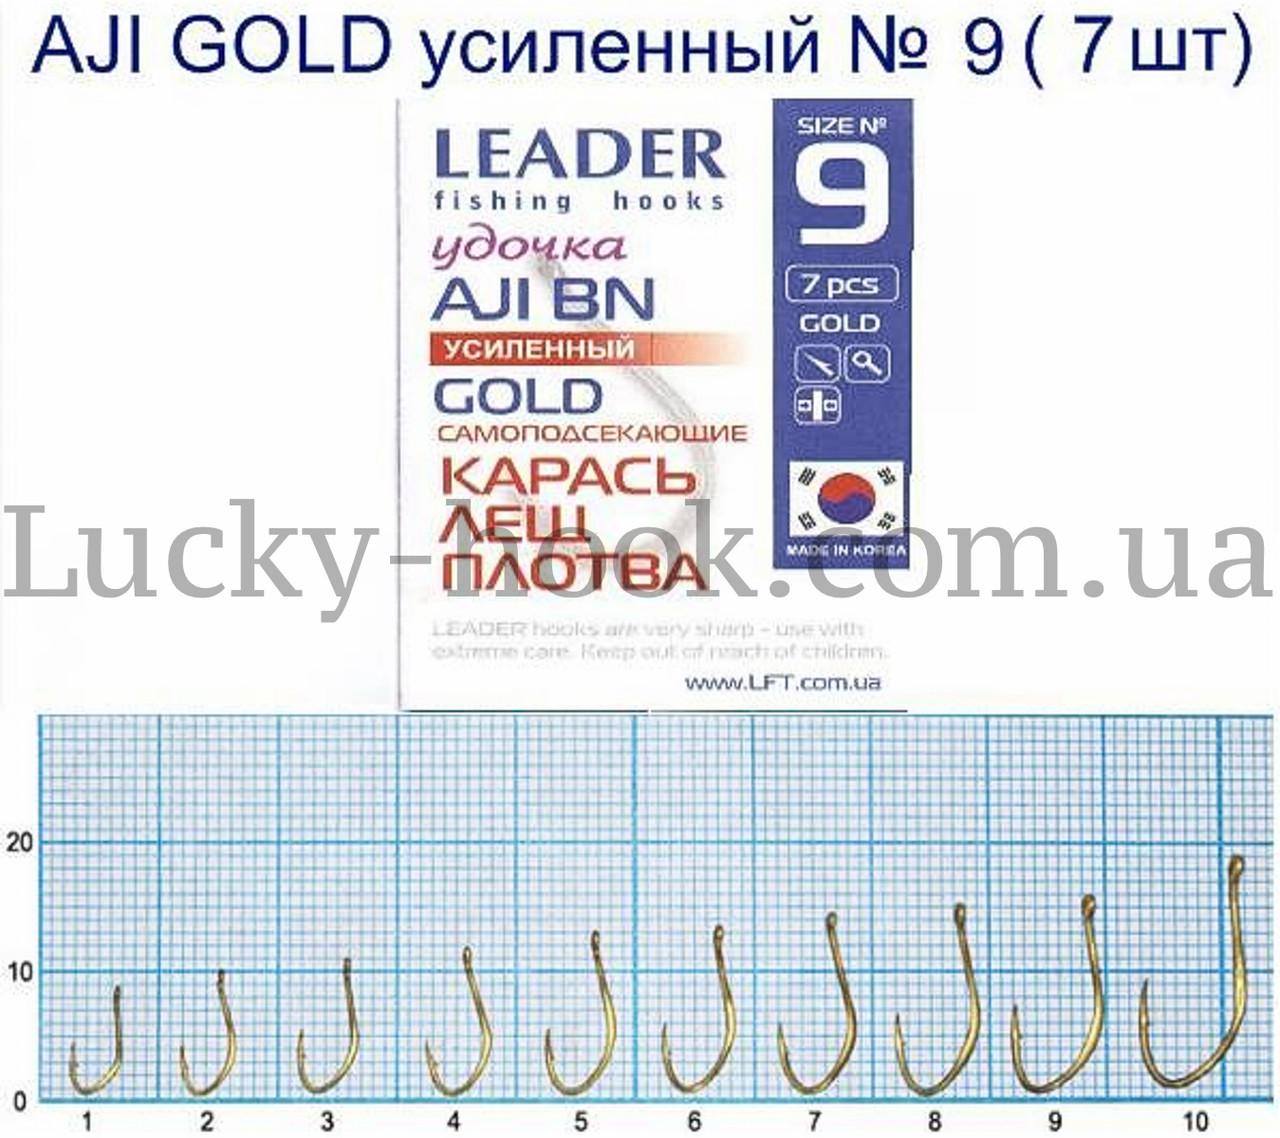 Крючок Leader удочка AJI GOLD самоподсекающие Карась, лещ, плотва  № 9